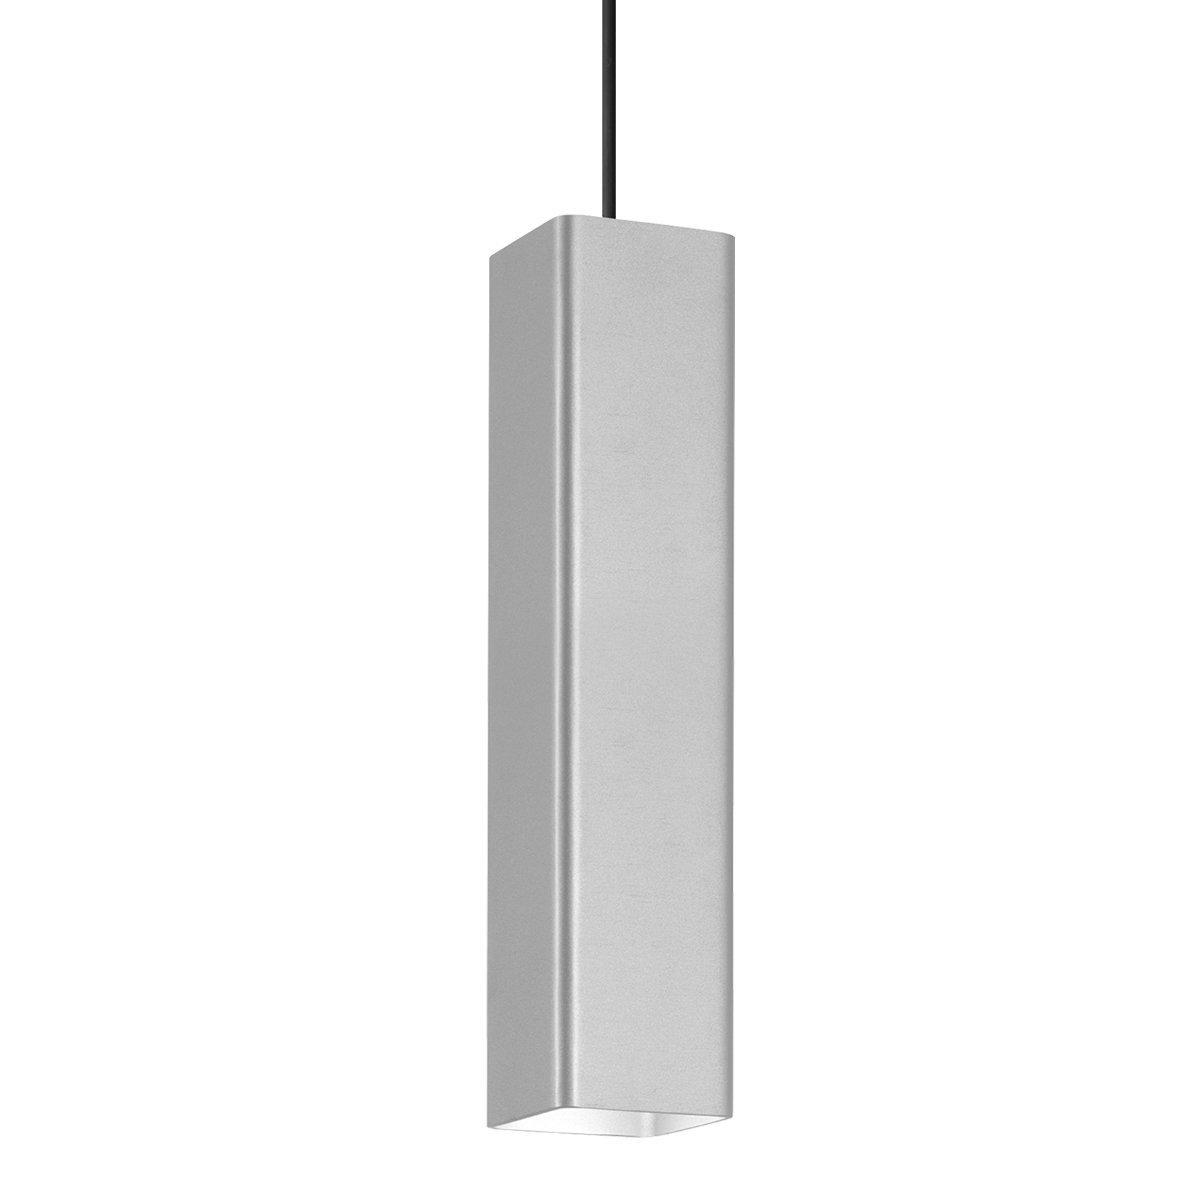 Wever & Ducr� Docus 3.0 Hanglamp Aluminium Brushed - 2700 Kelvin